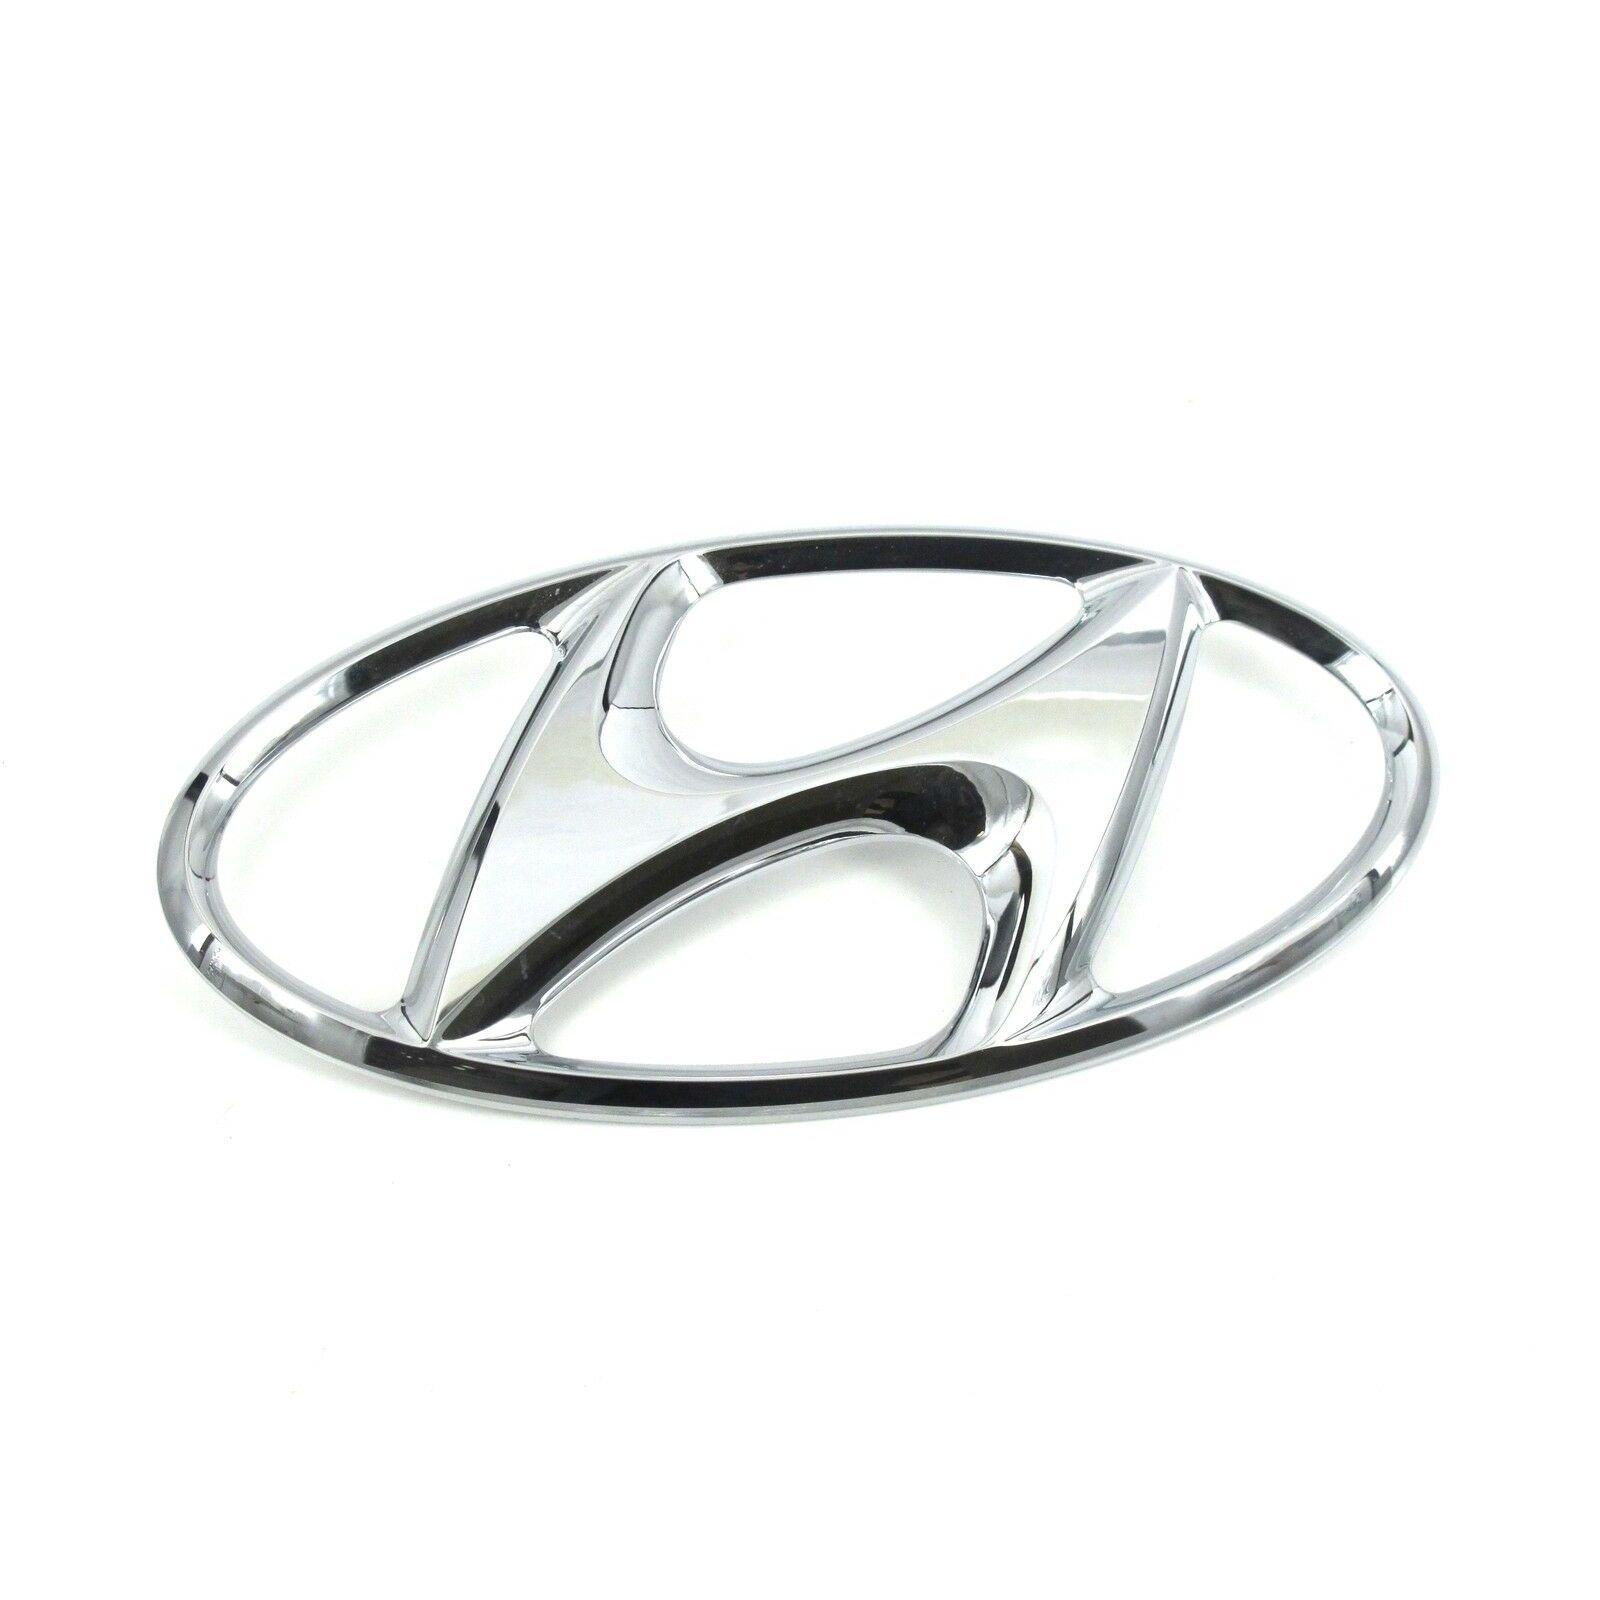 Emblema delantero Hyundai Accent nuevo original 86300-38000